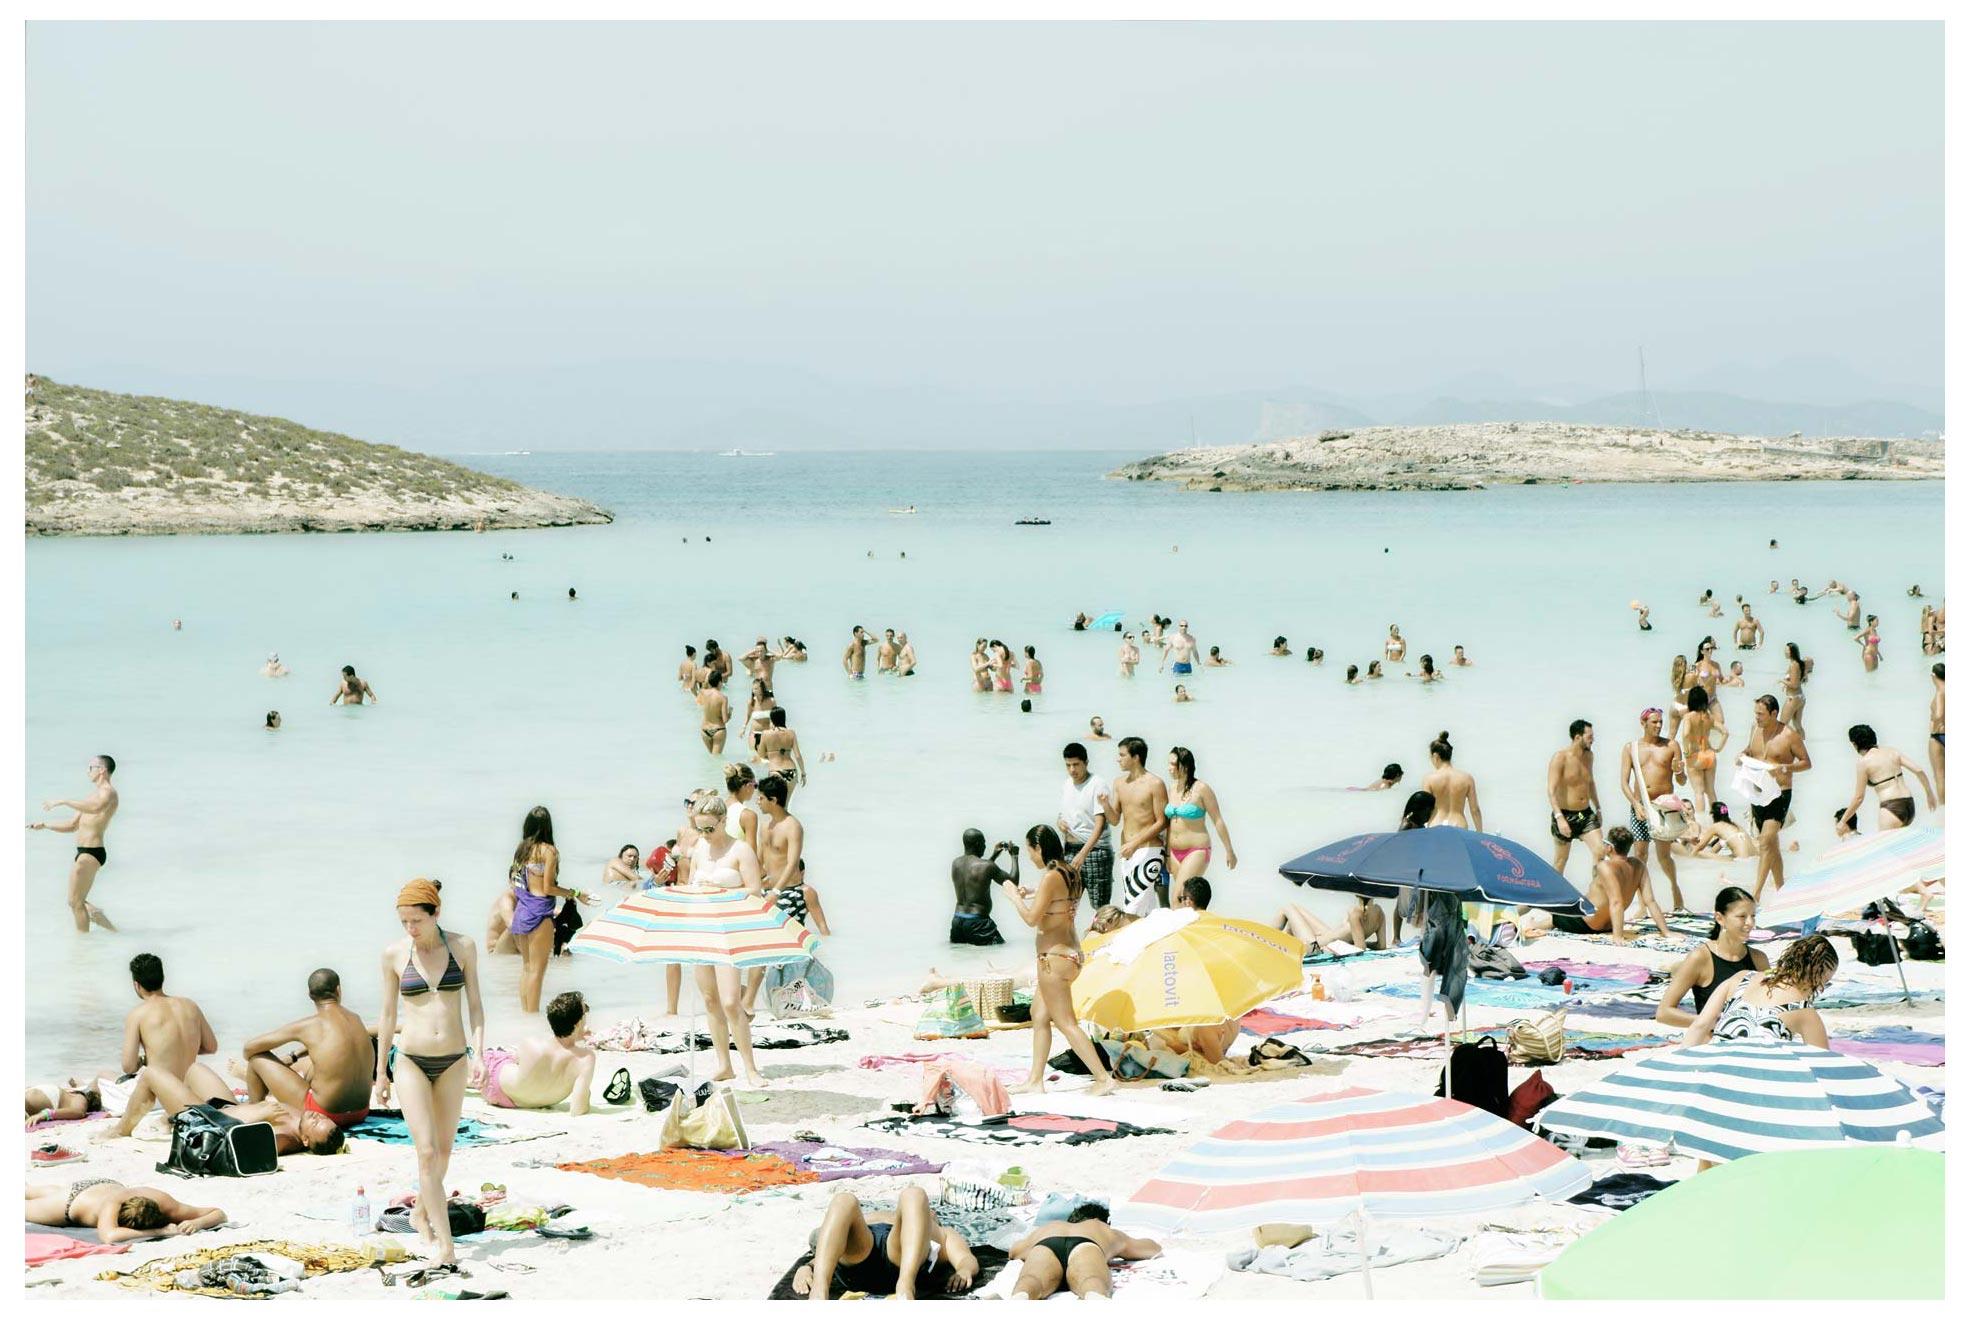 Formentera photography by Stephane Dessaint #5